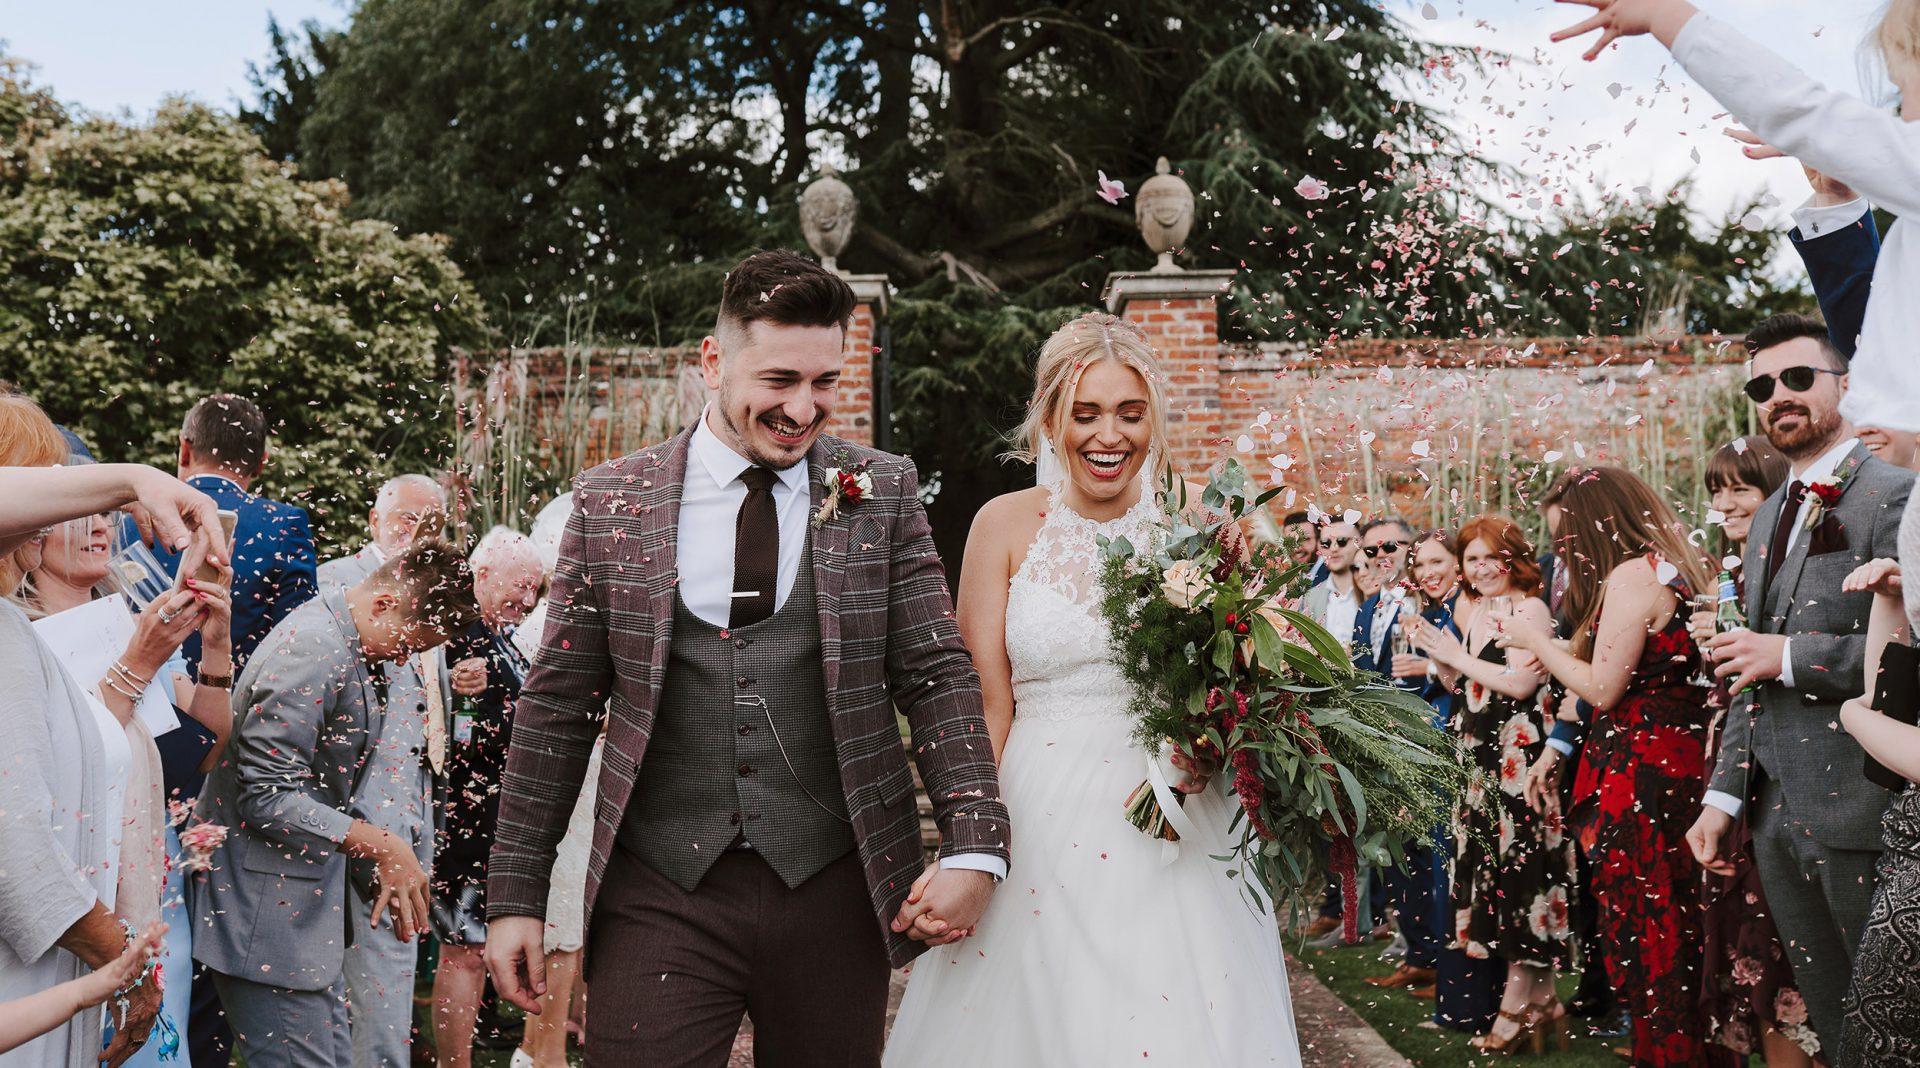 Georgi Mabee Wedding Photographer in Stamford